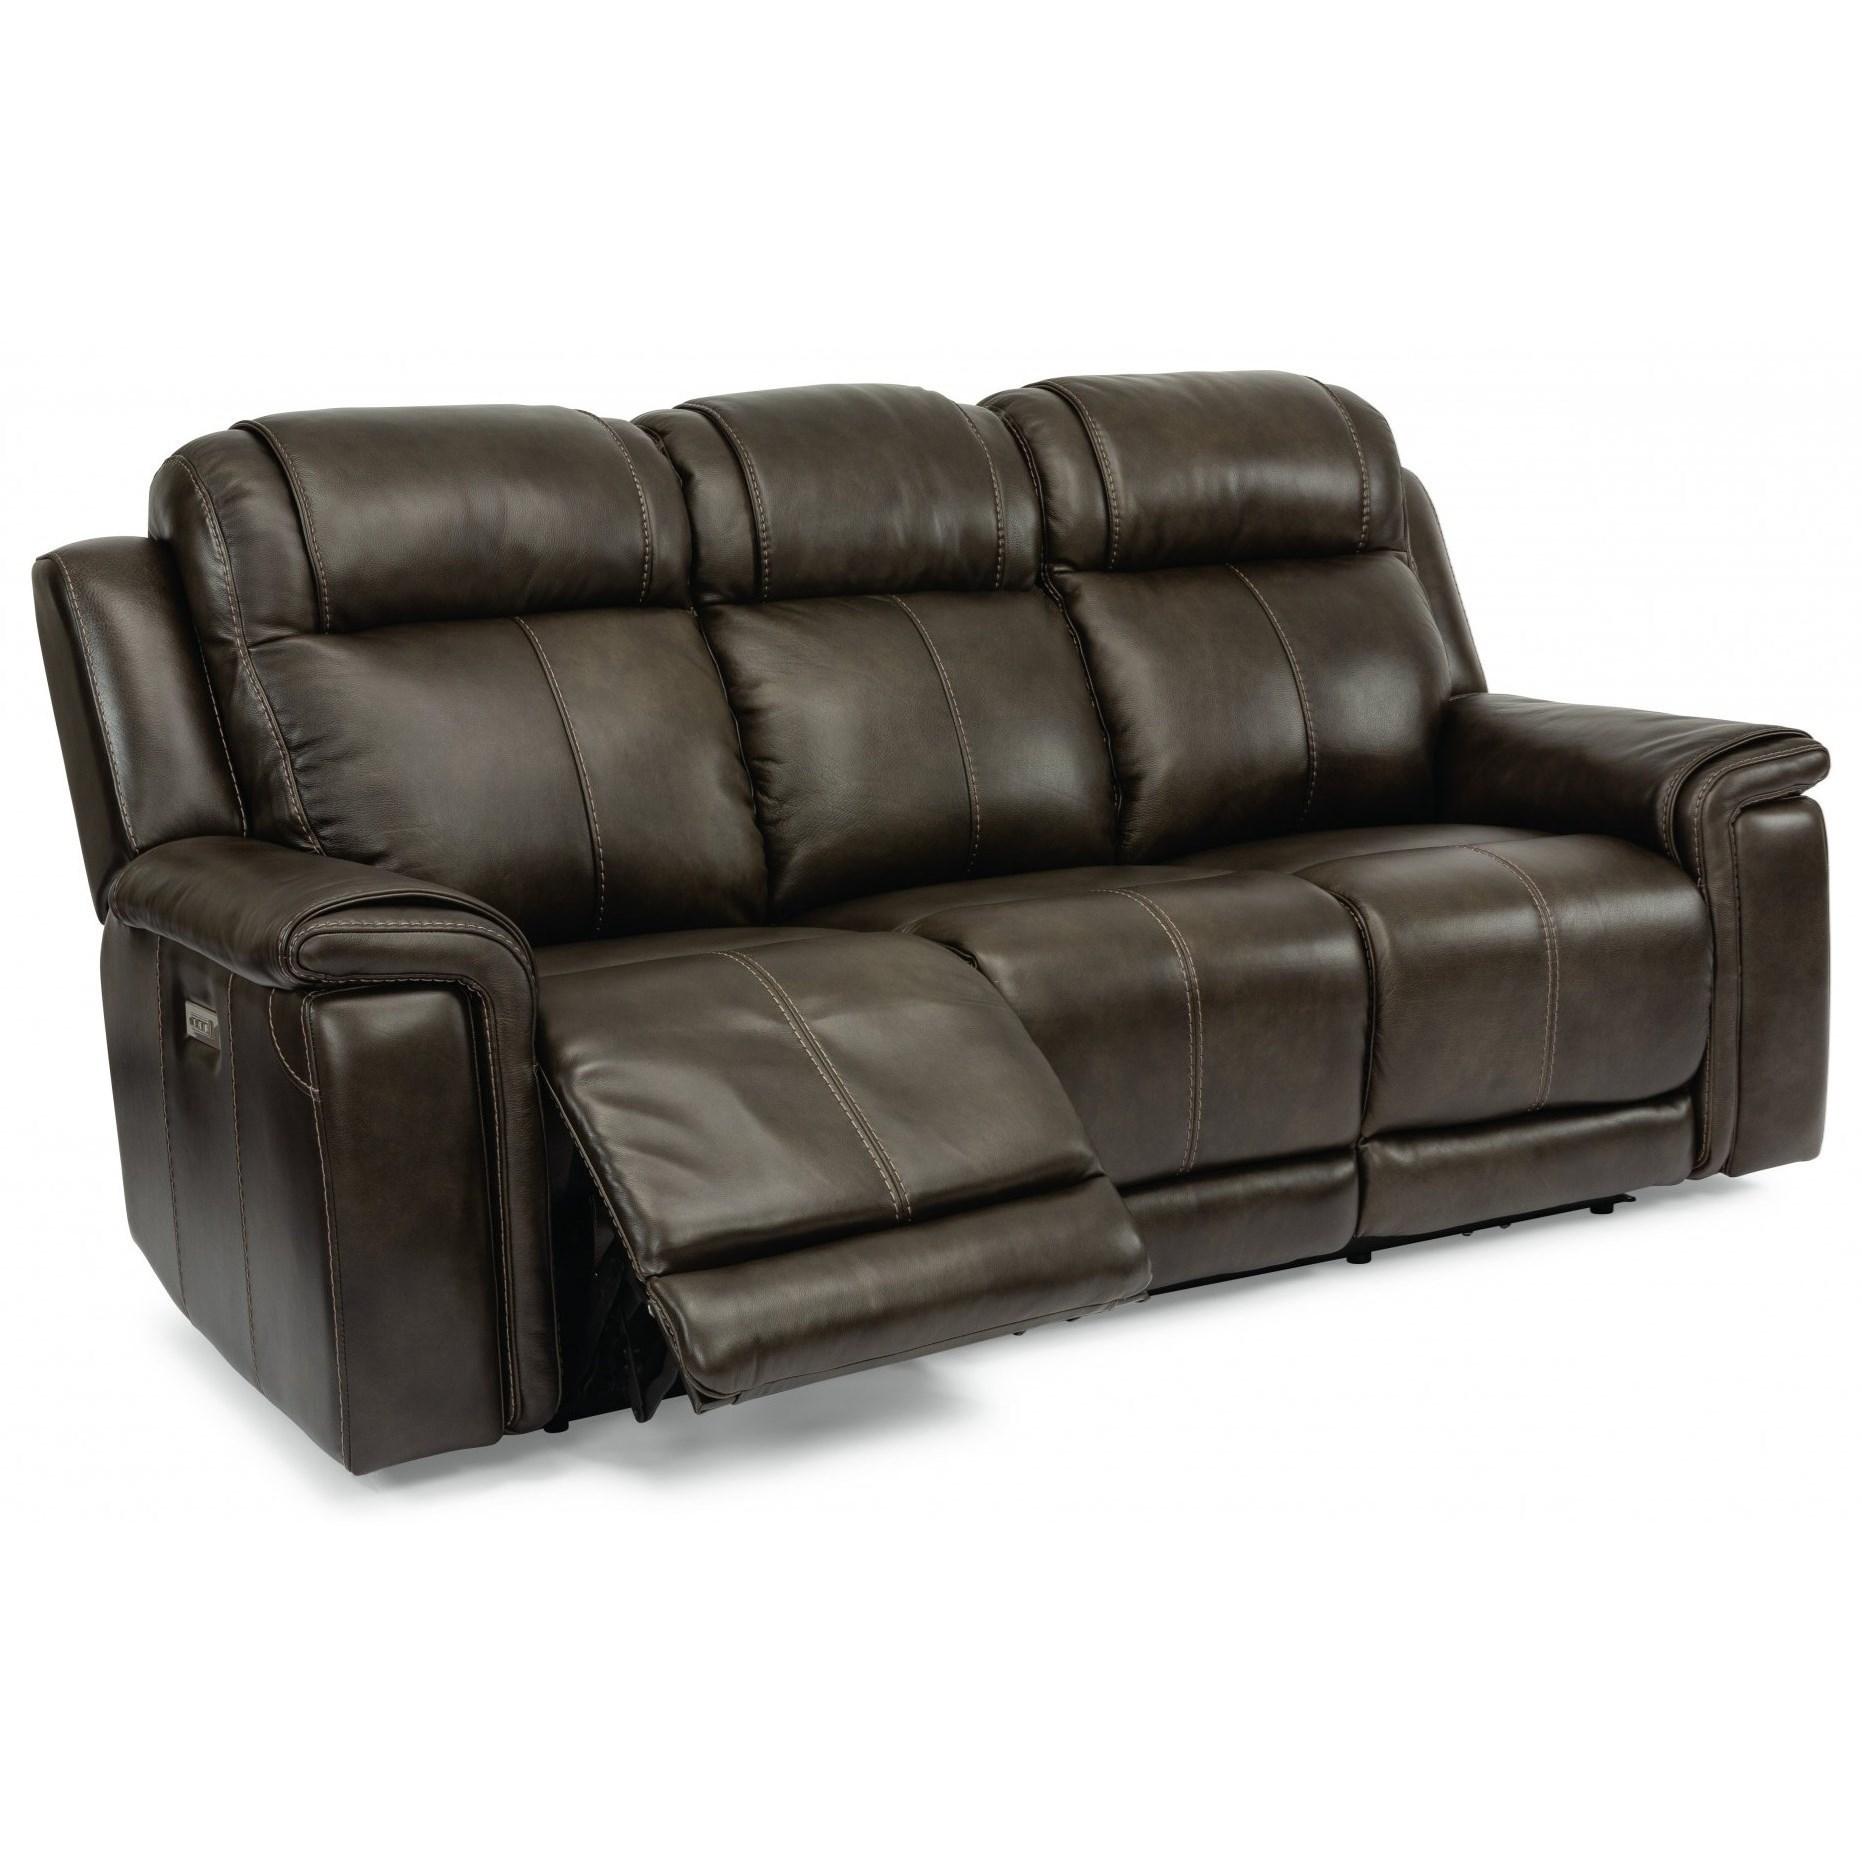 Latitudes - Kingsley Lay-Flat Power Reclining Sofa by Flexsteel at Walker's Furniture